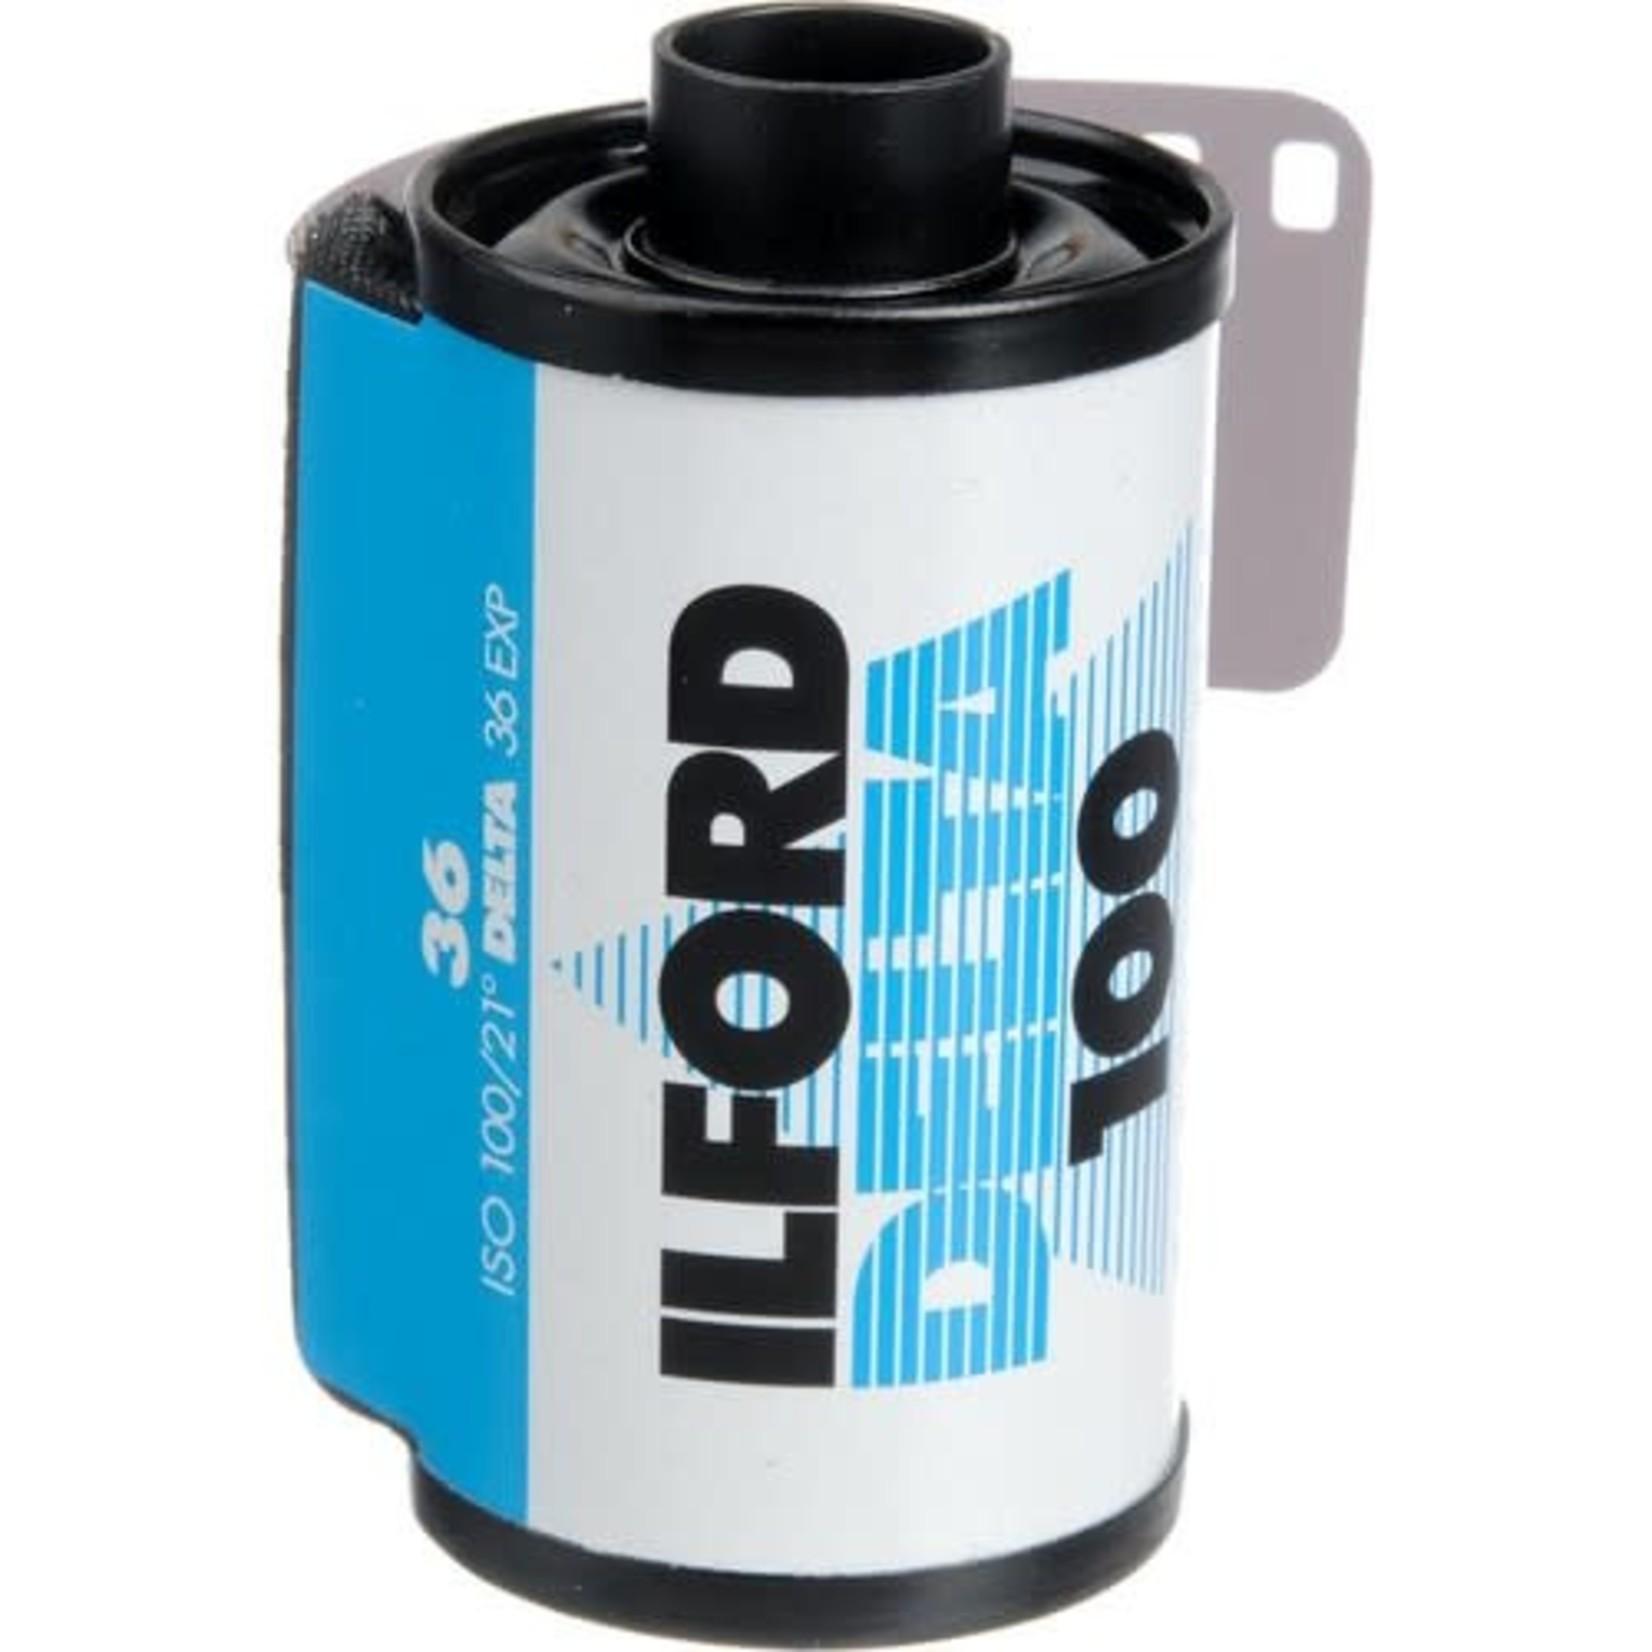 Ilford Ilford Delta 100 Professional Black and White Negative Film (35mm Roll Film, 36 Exposures)